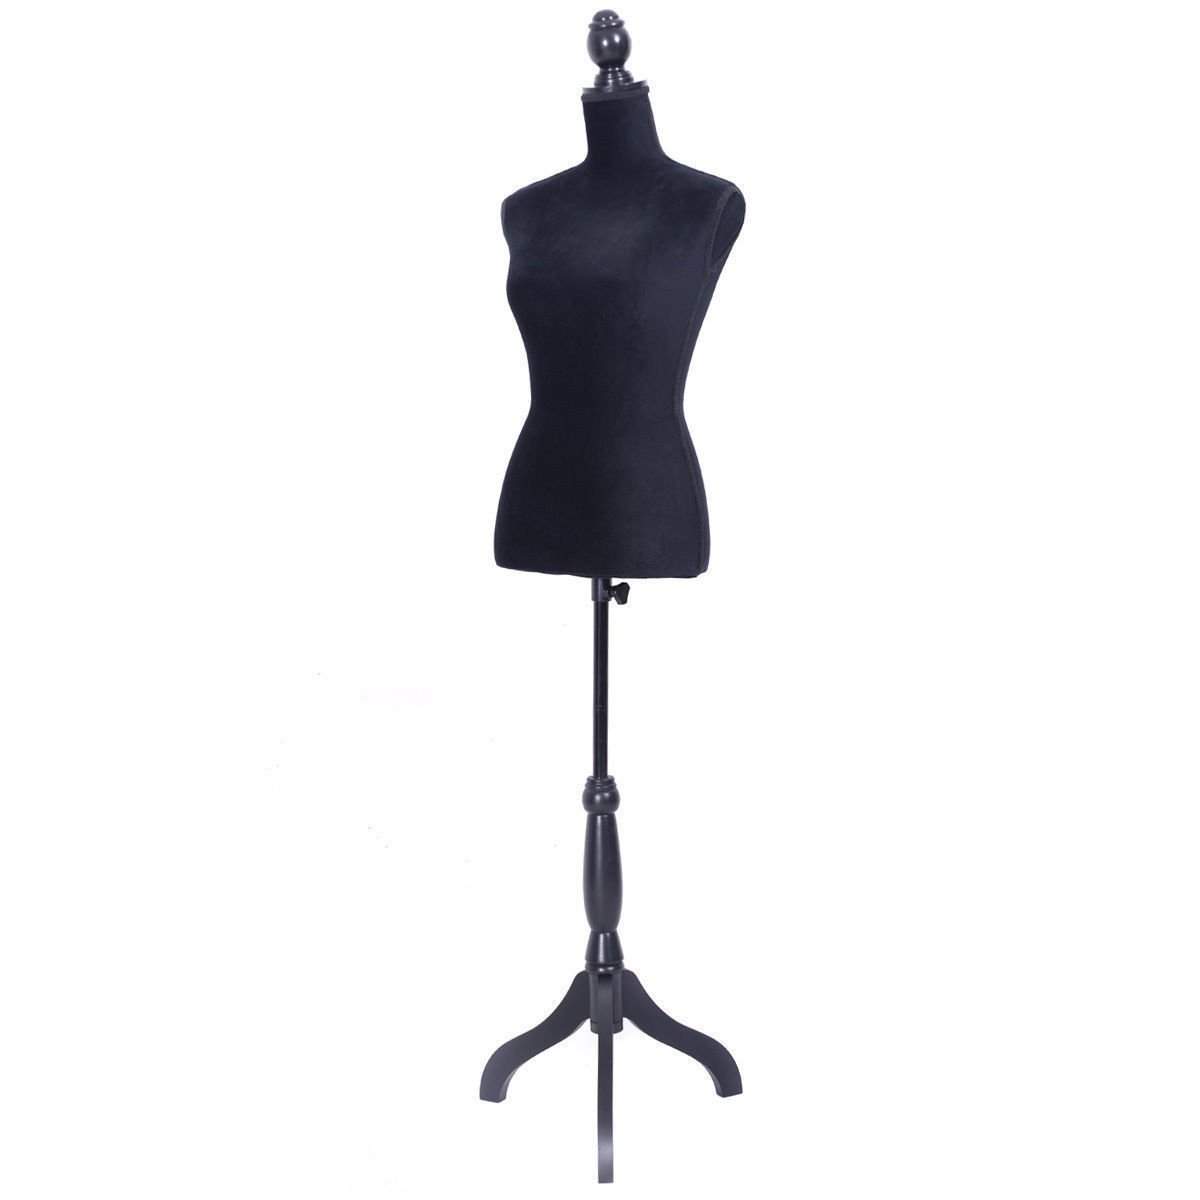 Tobbi Black Female Mannequin Torso Dress Form Display W/Black Tripod Stand